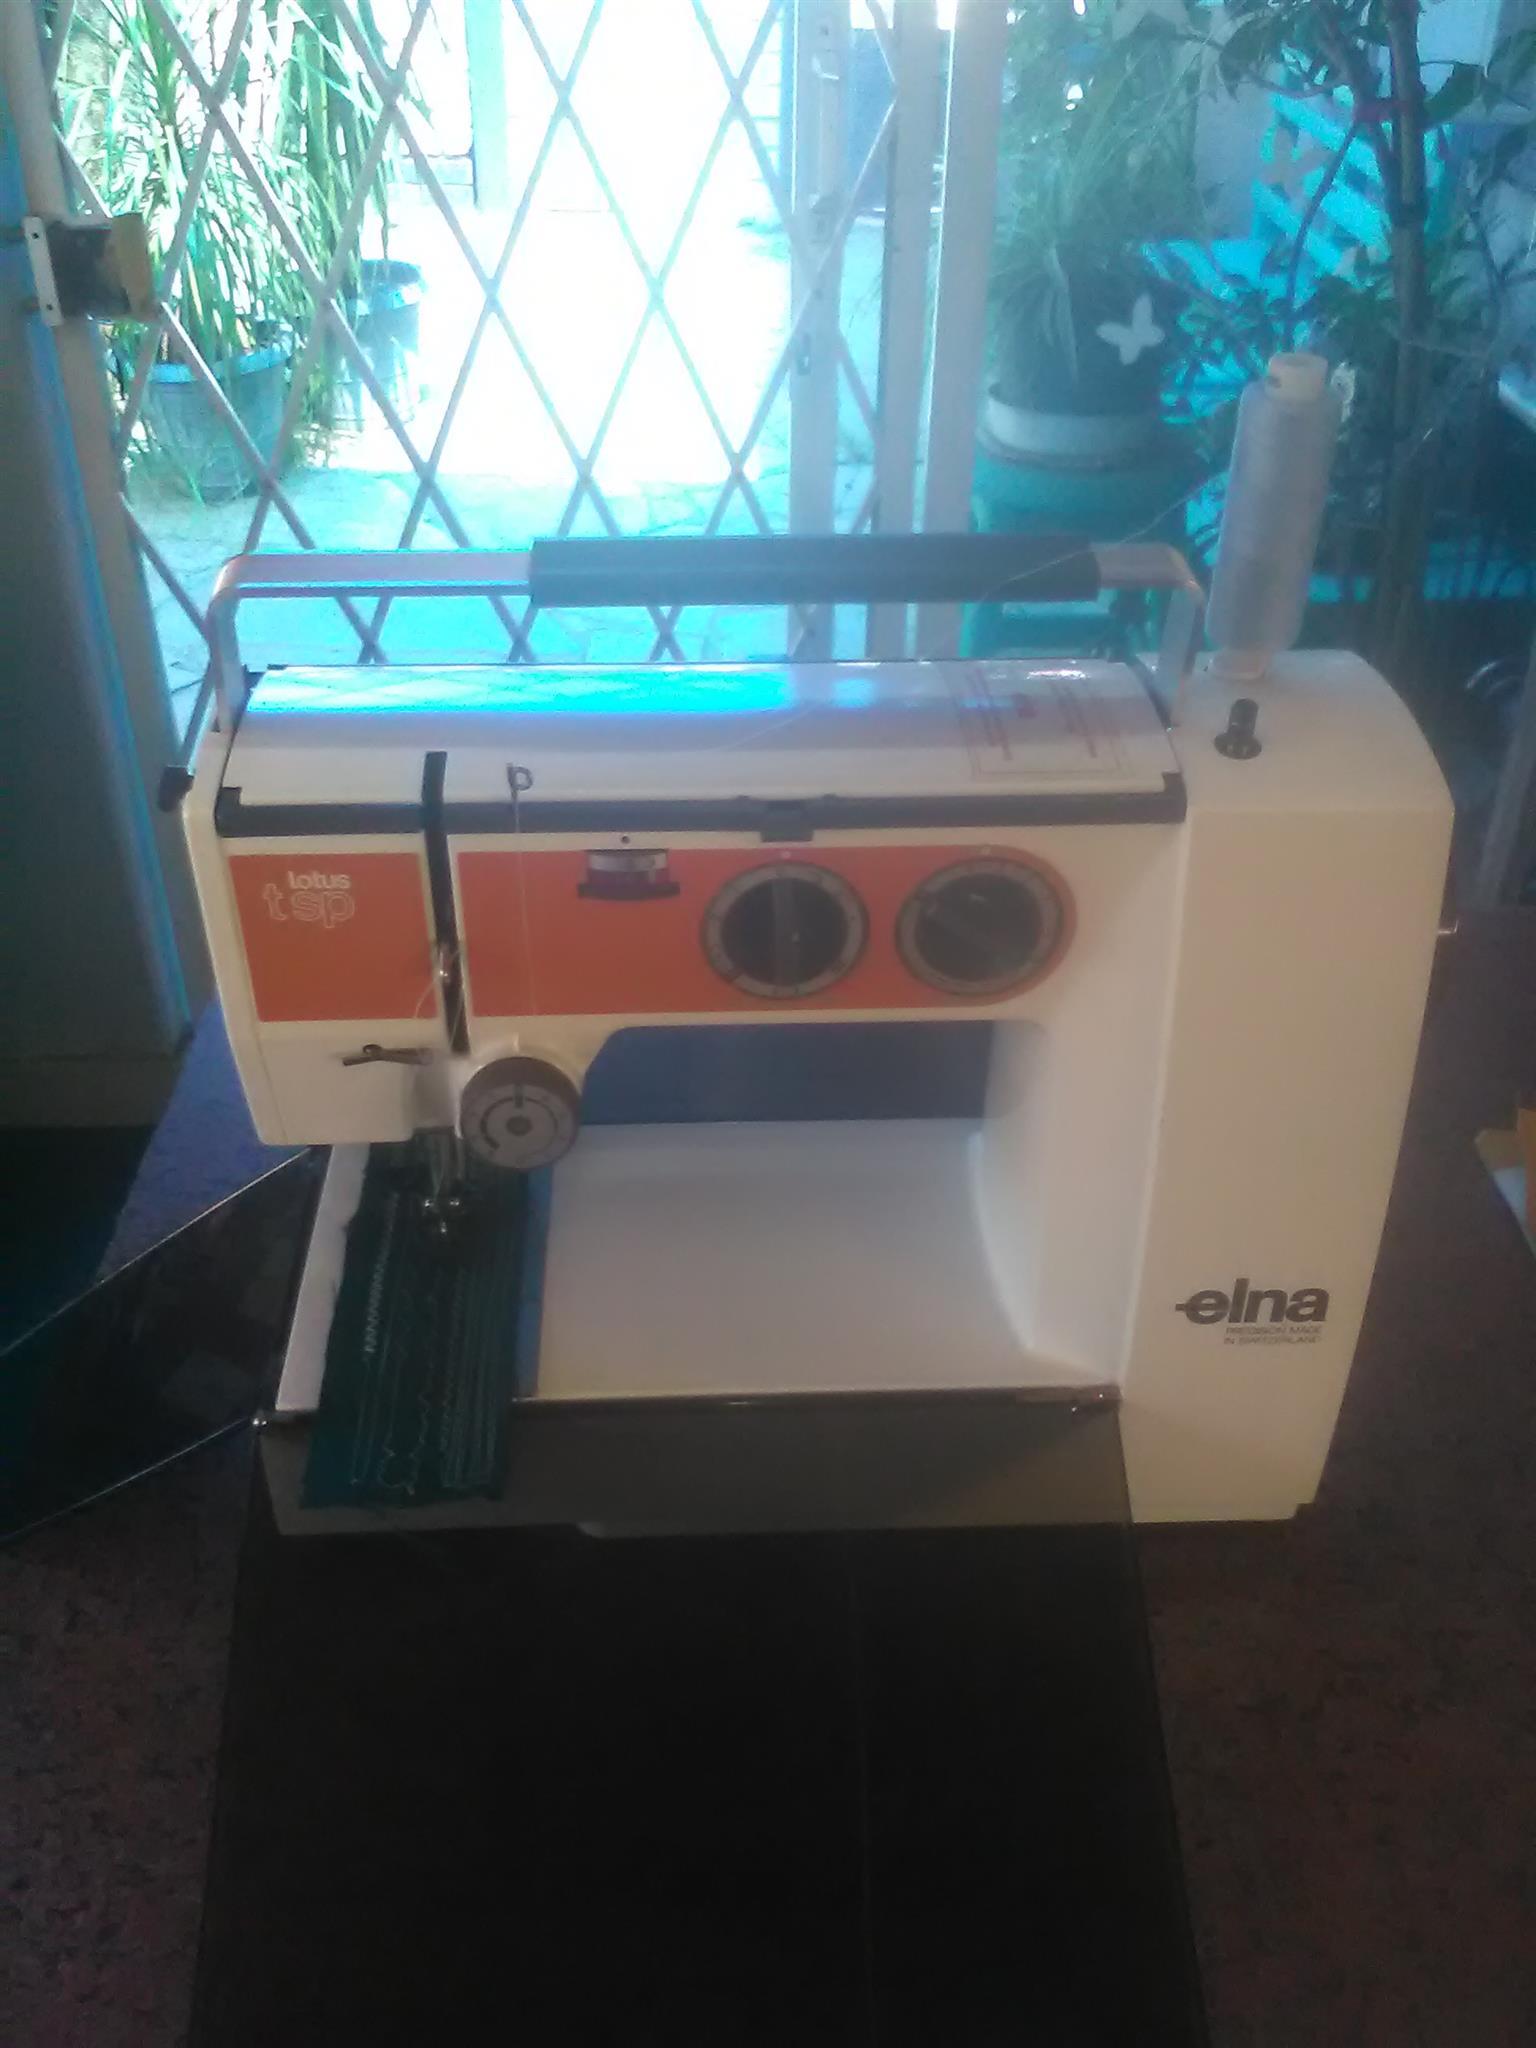 Elna Lotus tsp sewing machine.